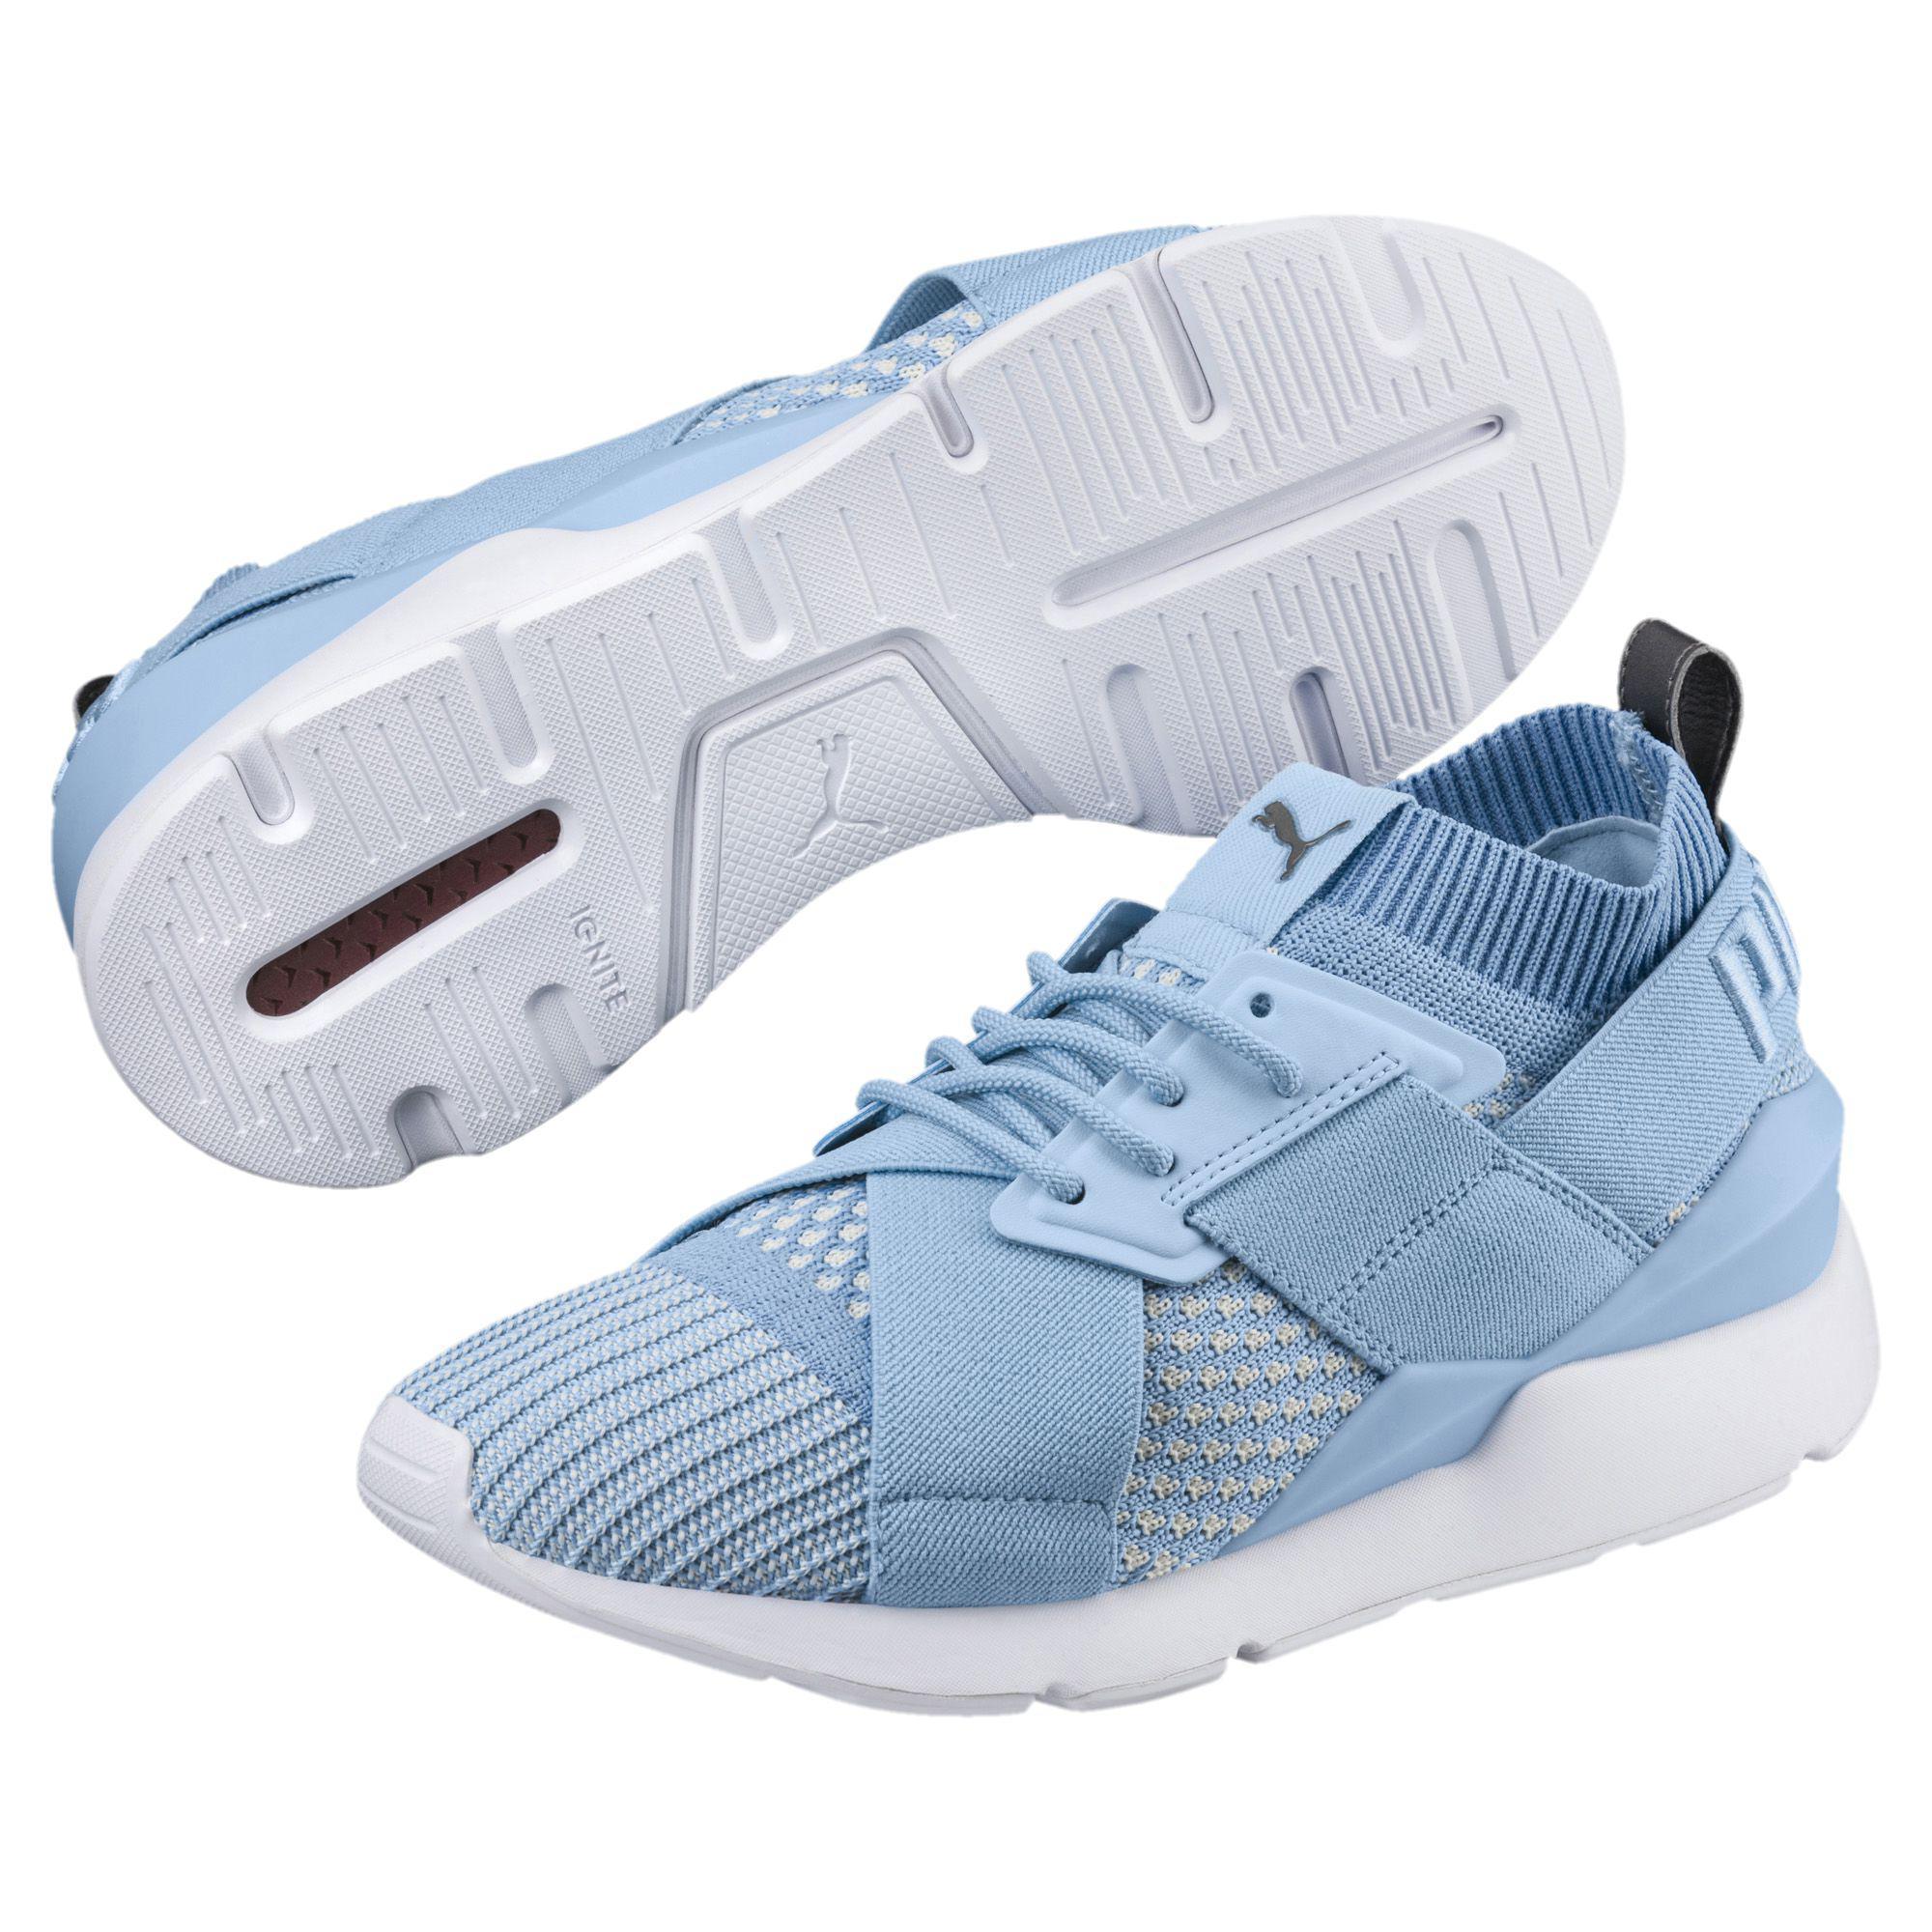 6698642f8699 PUMA - Blue Muse Evoknit Women s Sneakers - Lyst. View fullscreen